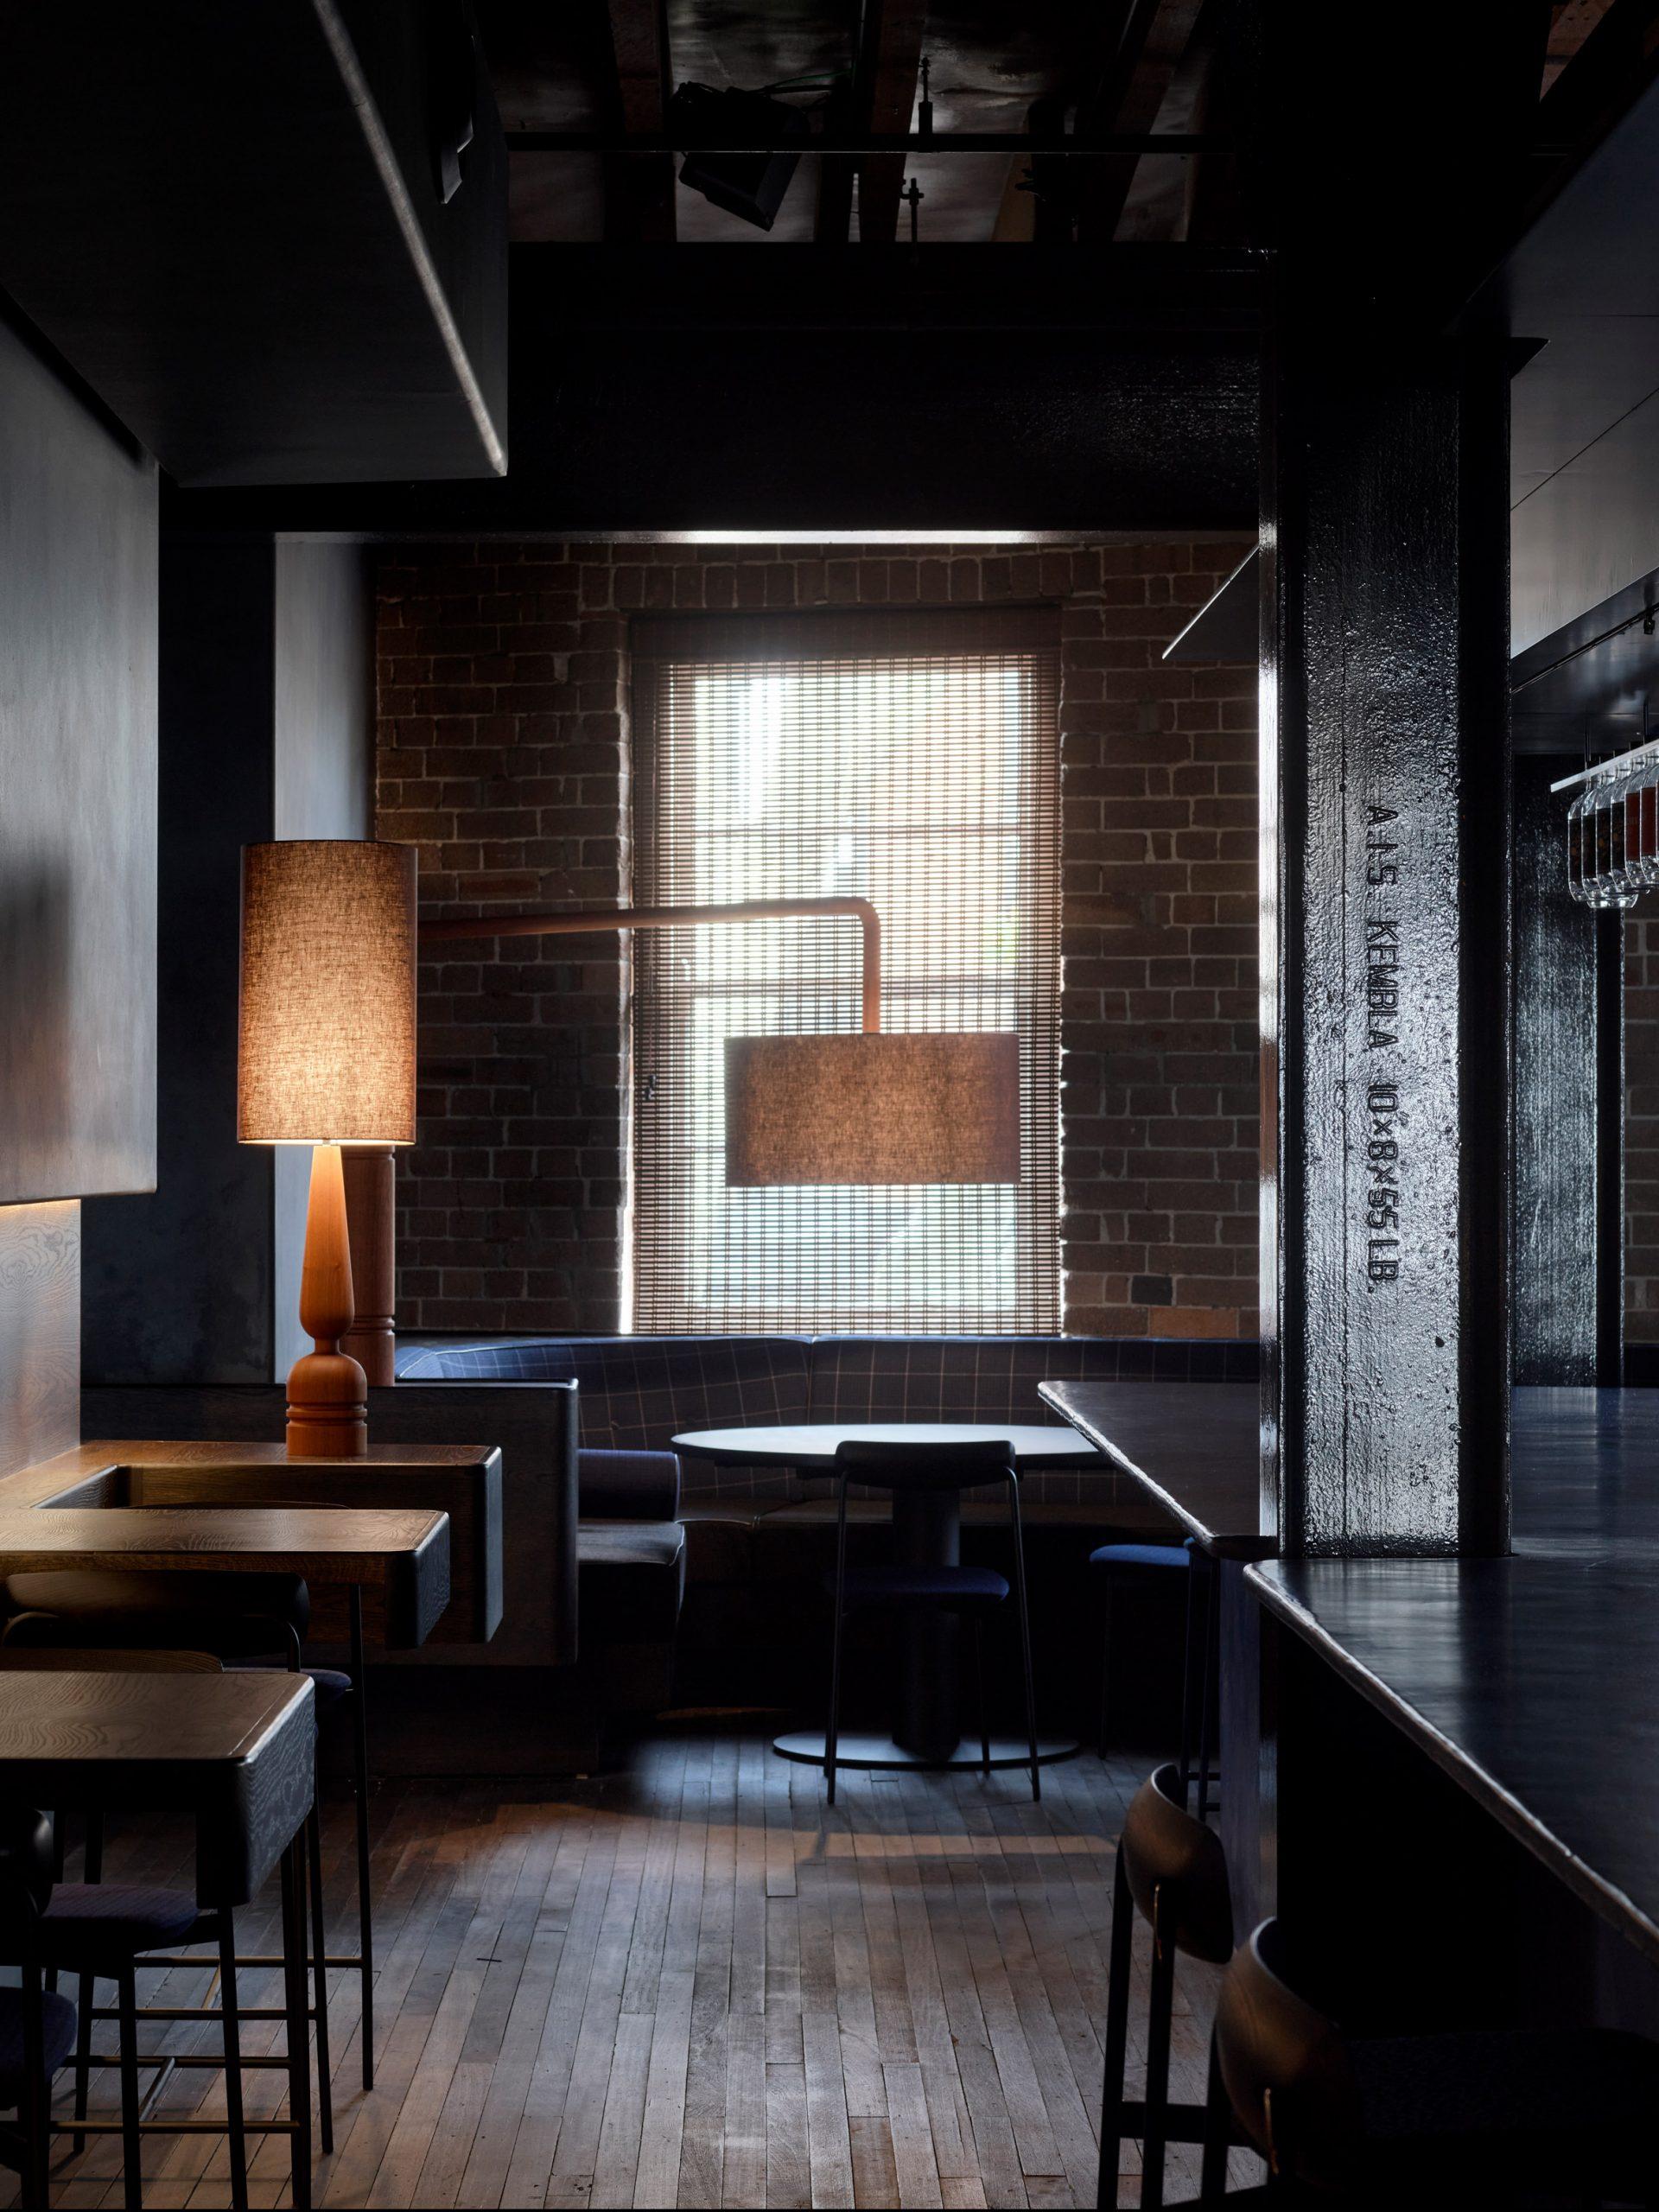 Four Pillars Laboratory has blackened walls